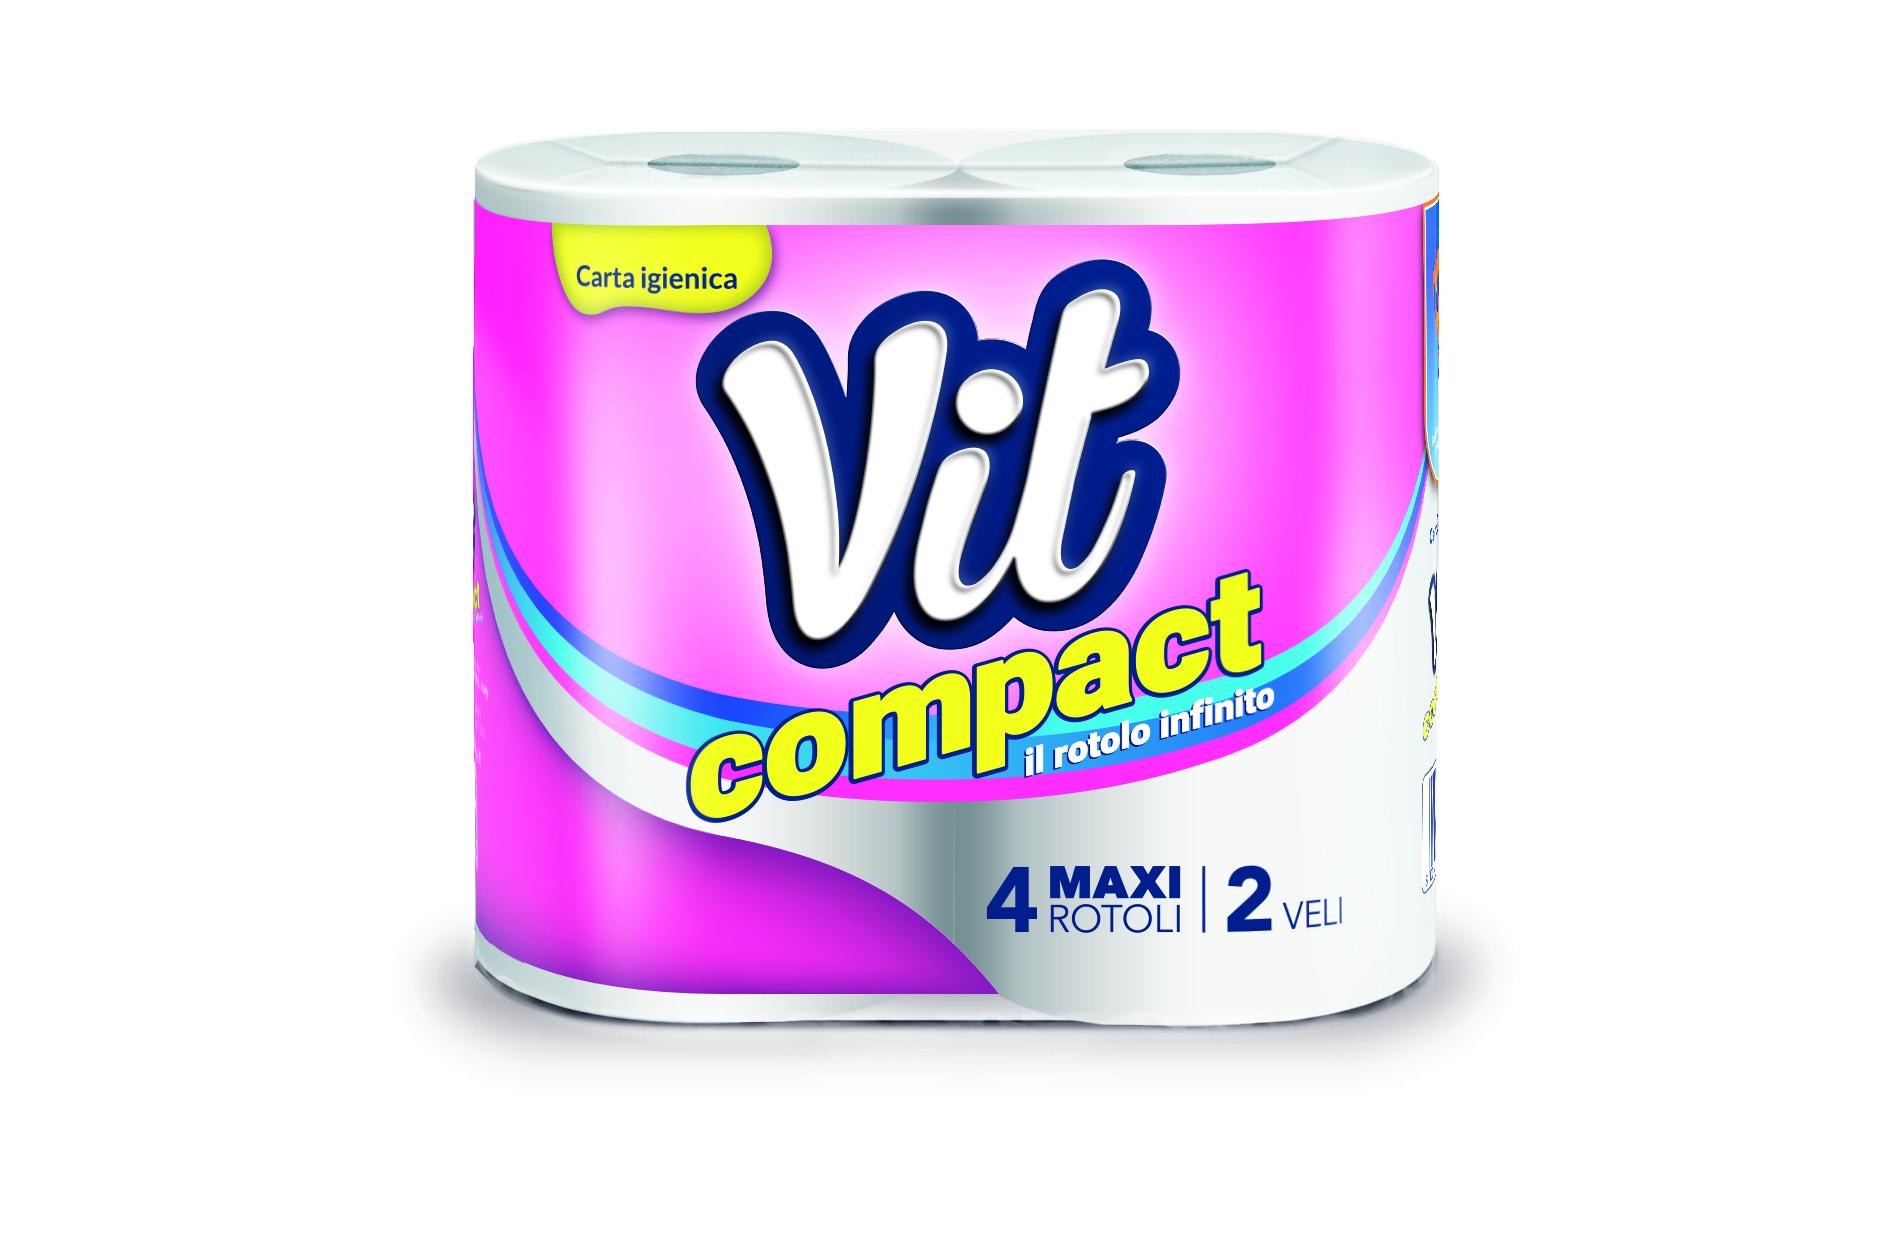 CARTA IG. VIT X 4 COMPACT